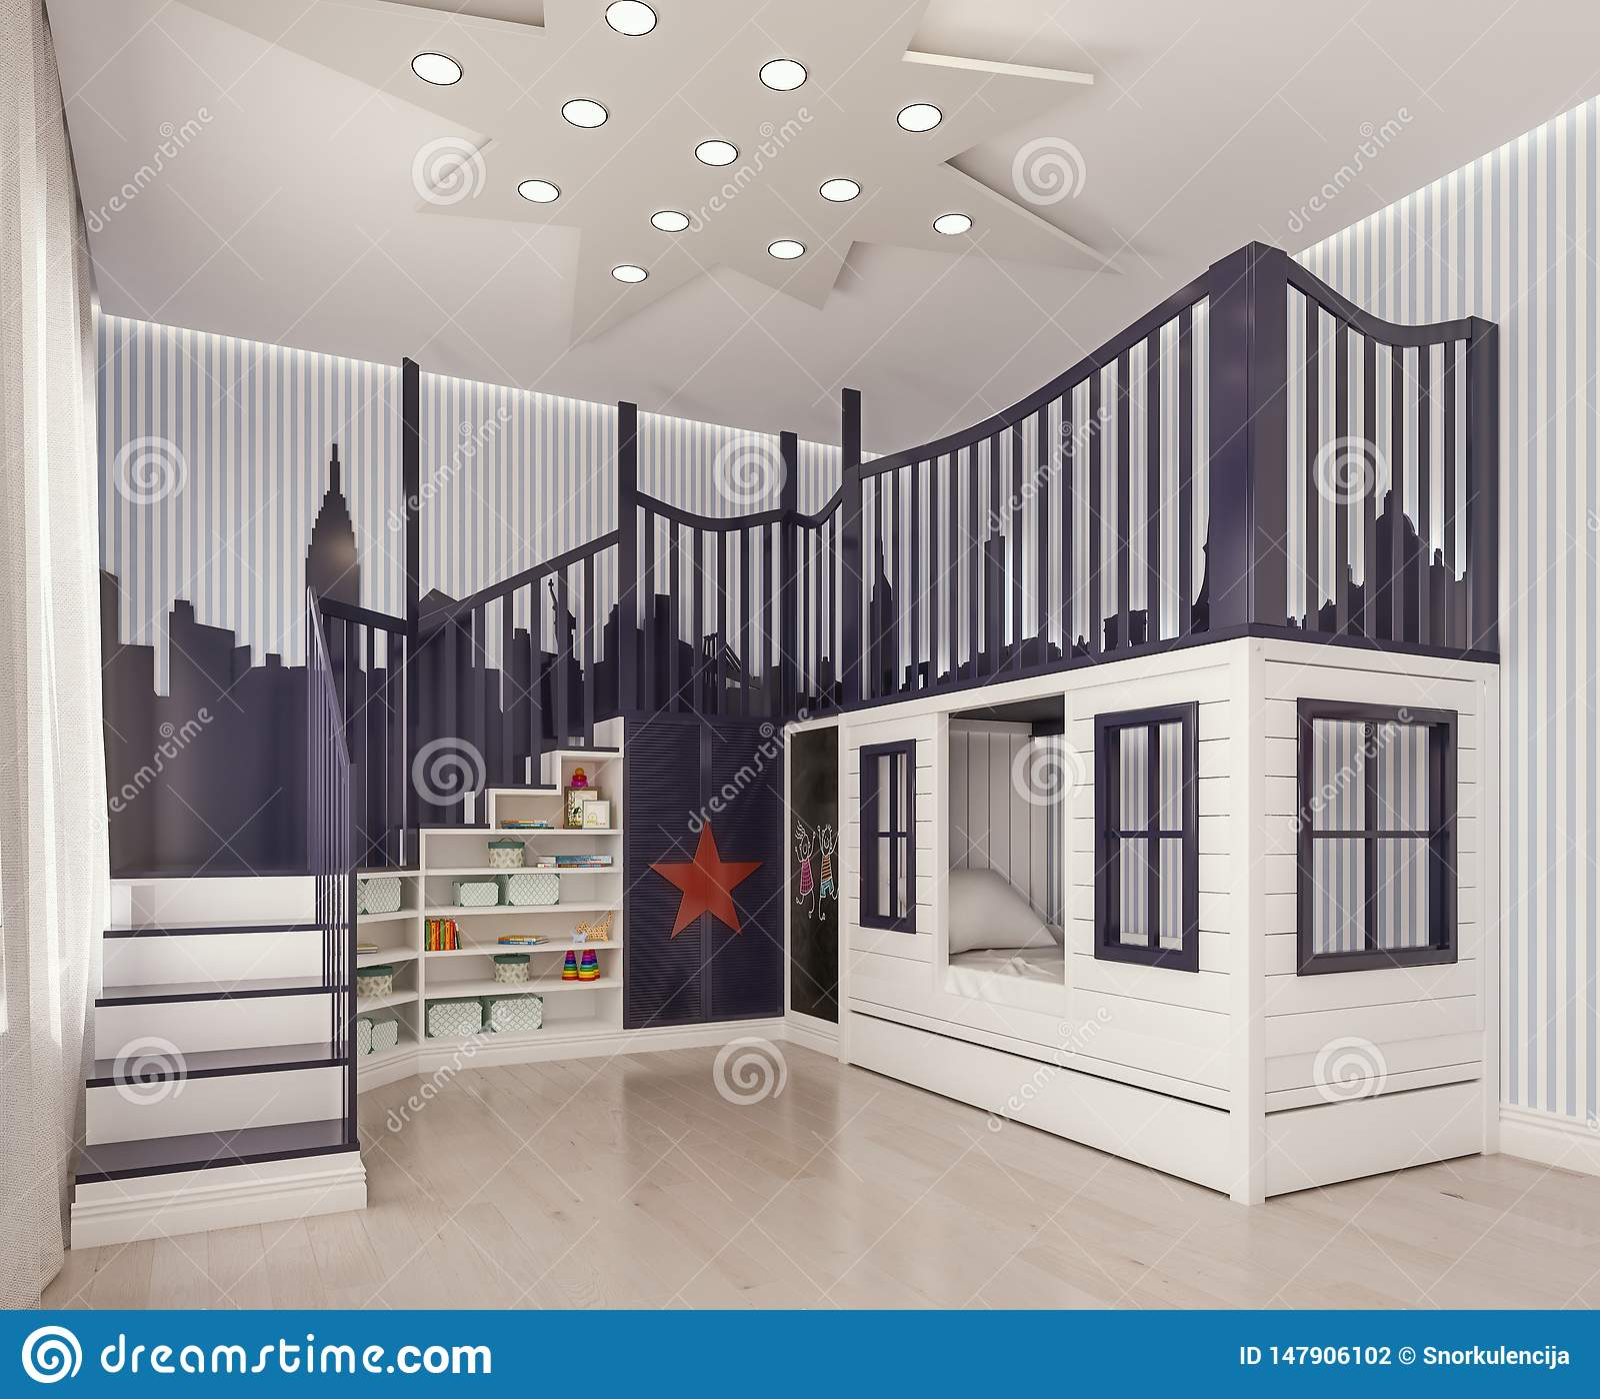 Modern Interior Design Kids Bedroom, Children Room, Playroom ...